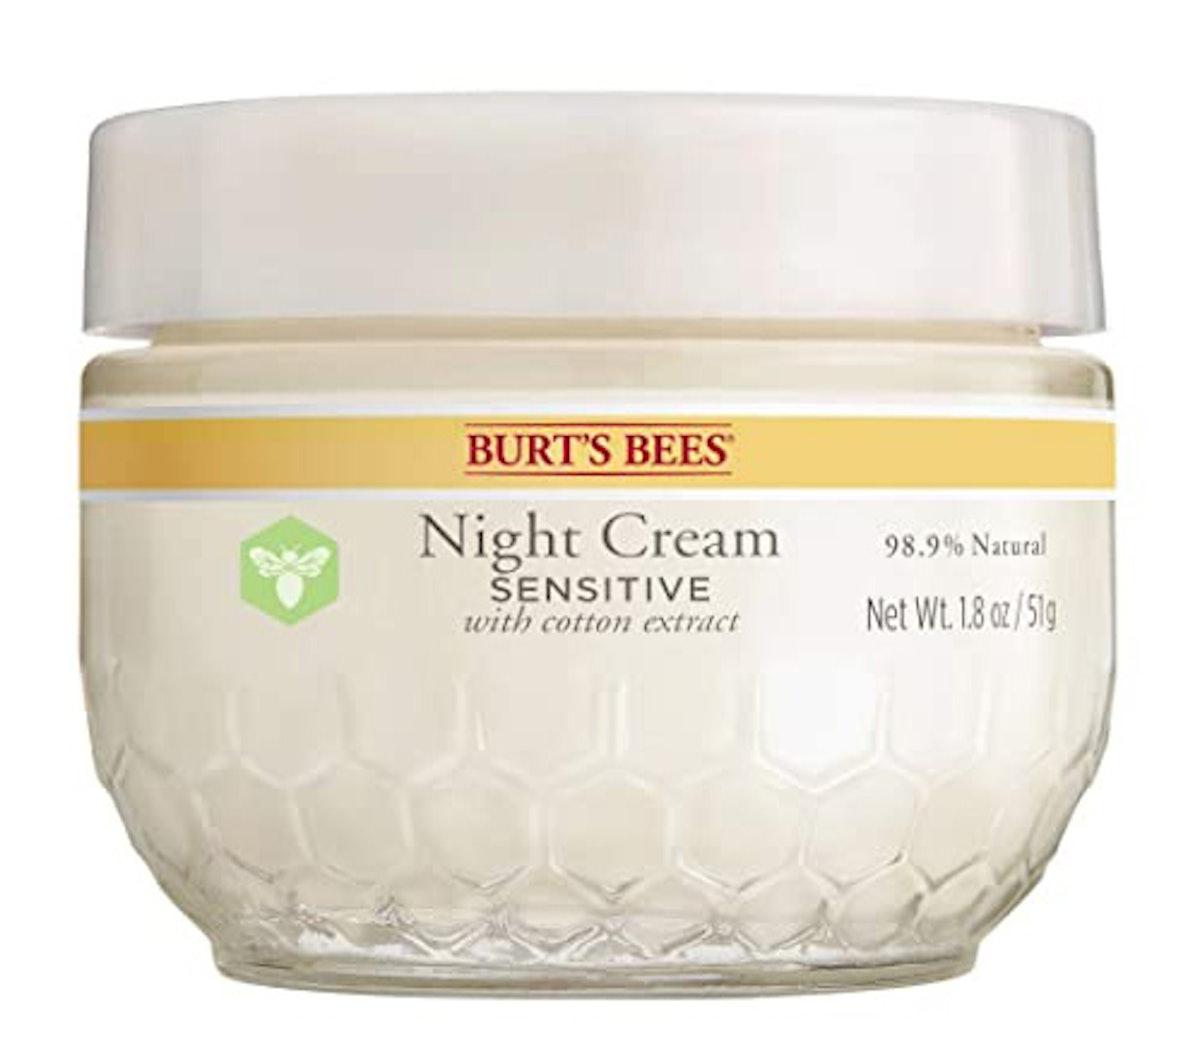 Burt's Bees Night Cream Sensitive